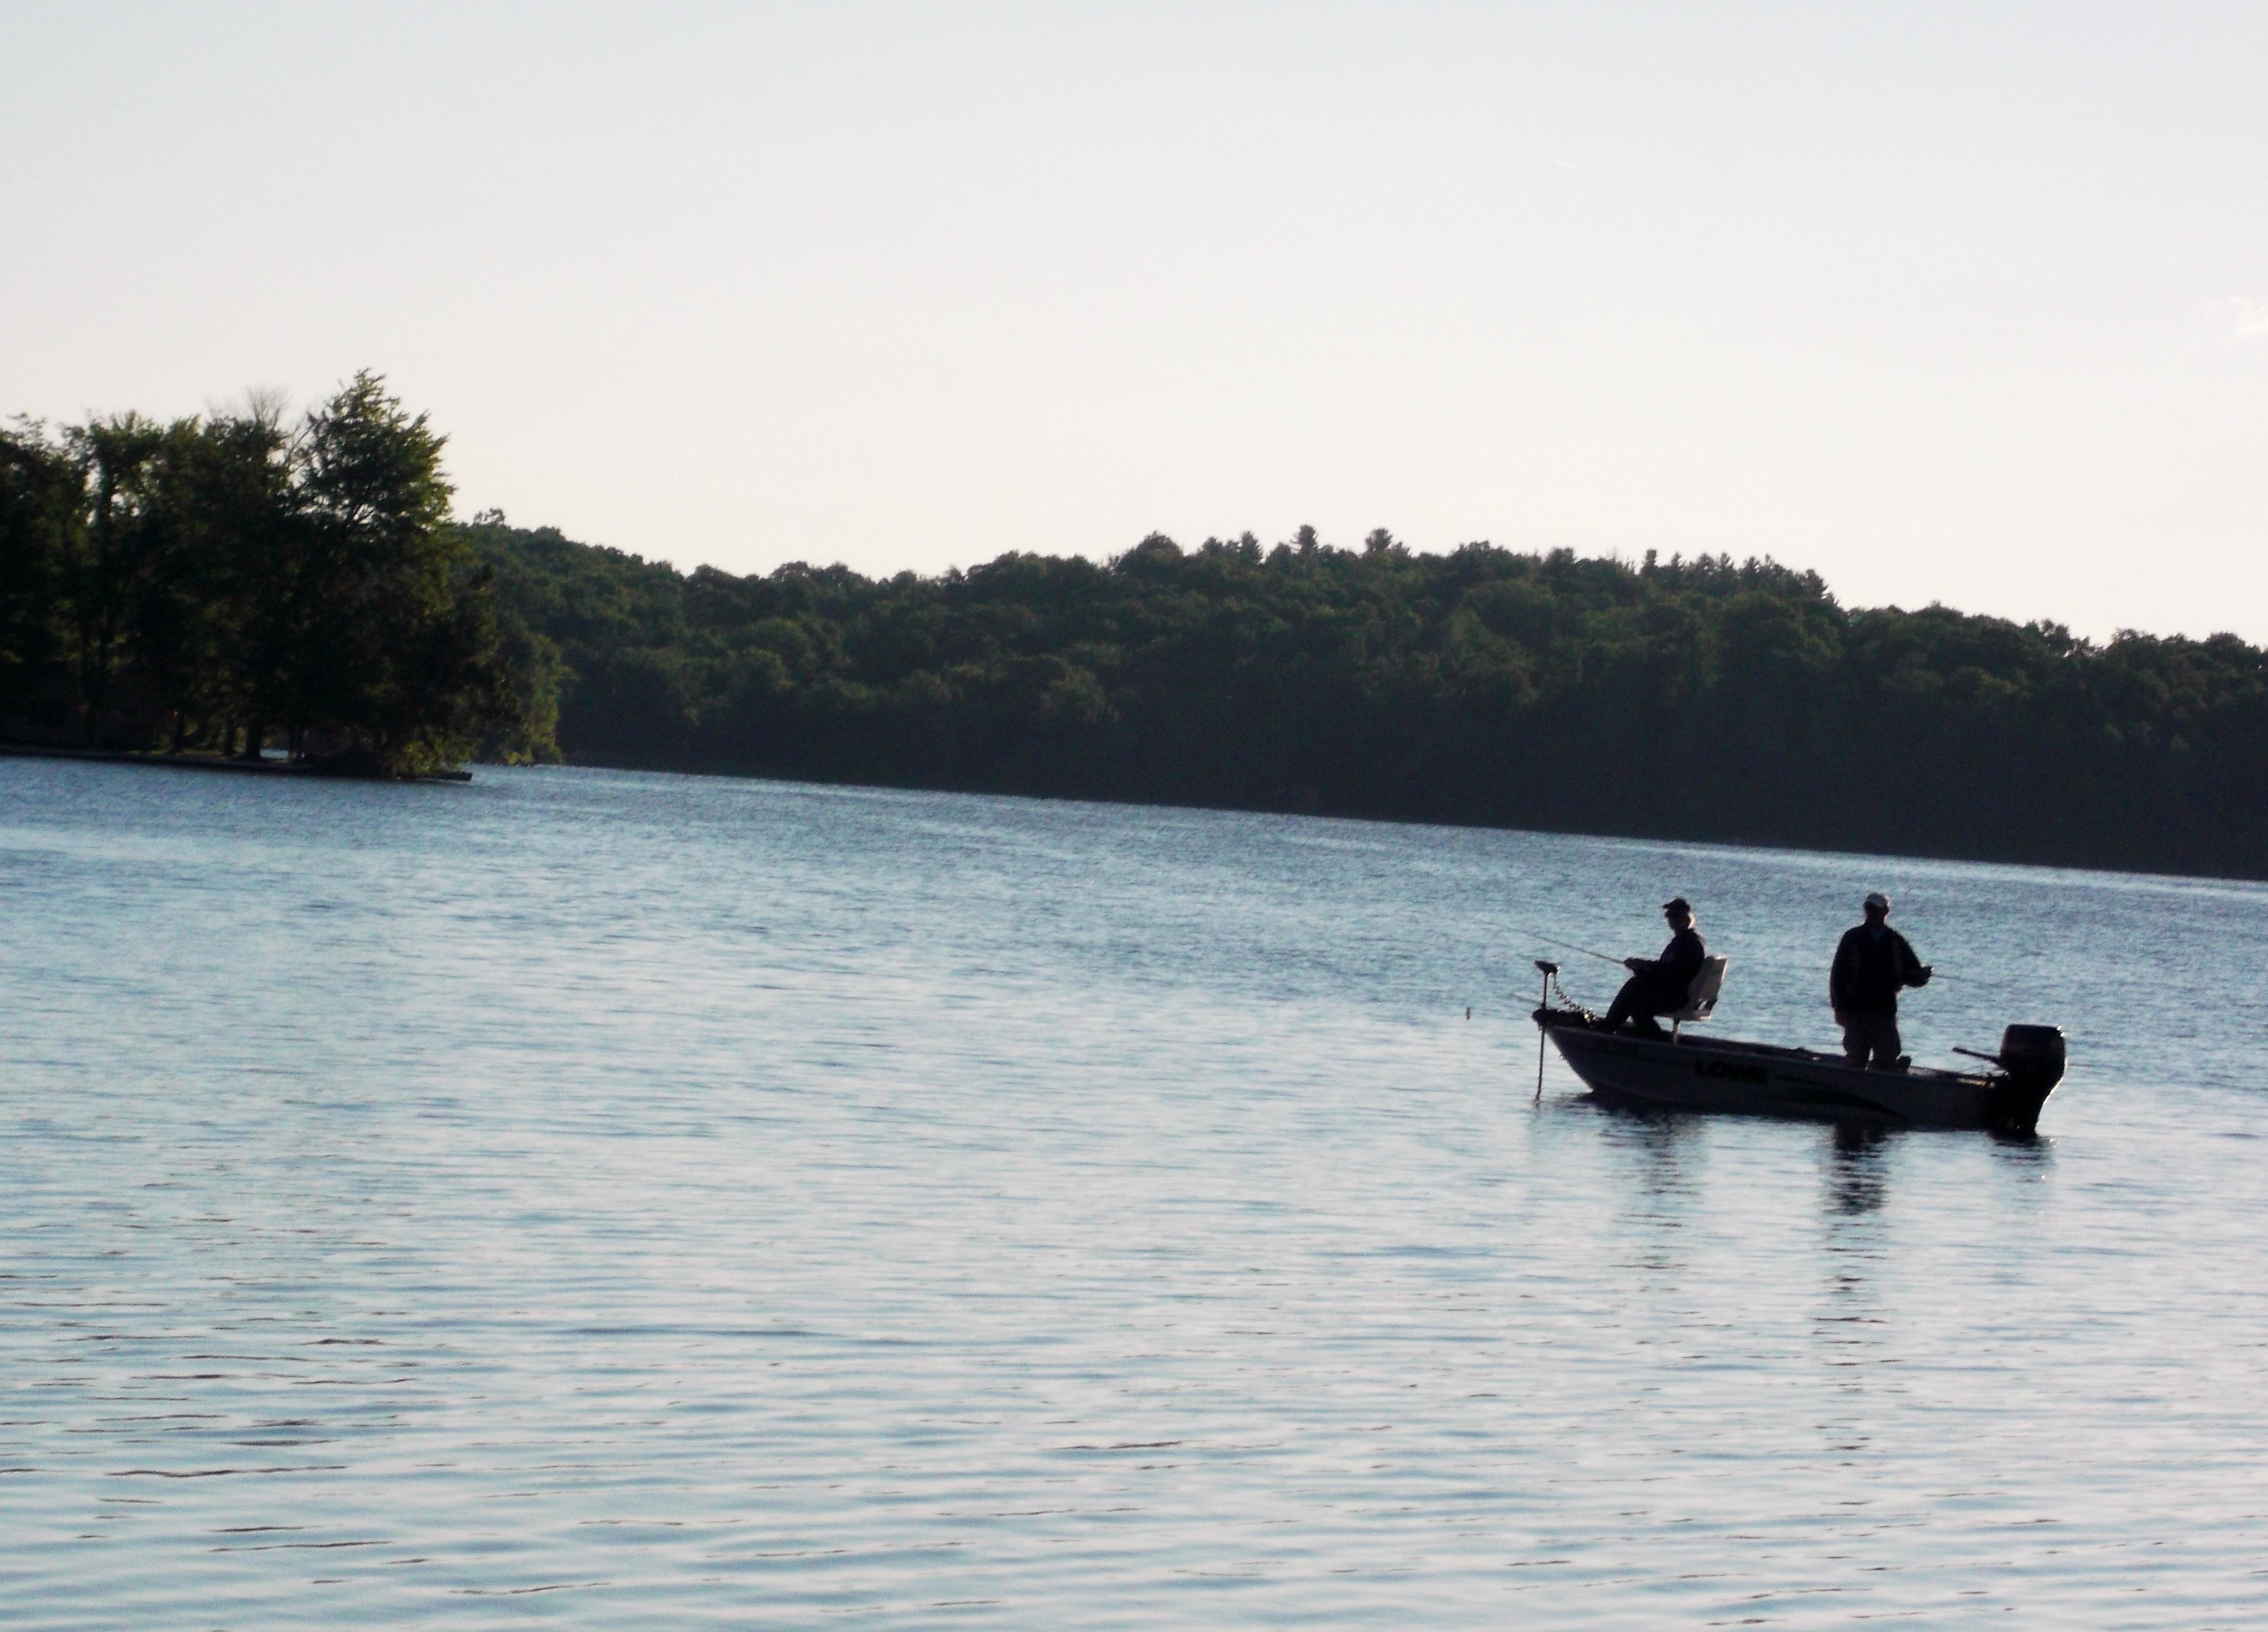 Dog Lake Resort Ranch, Thunder Bay, Ontario - TripAdvisor